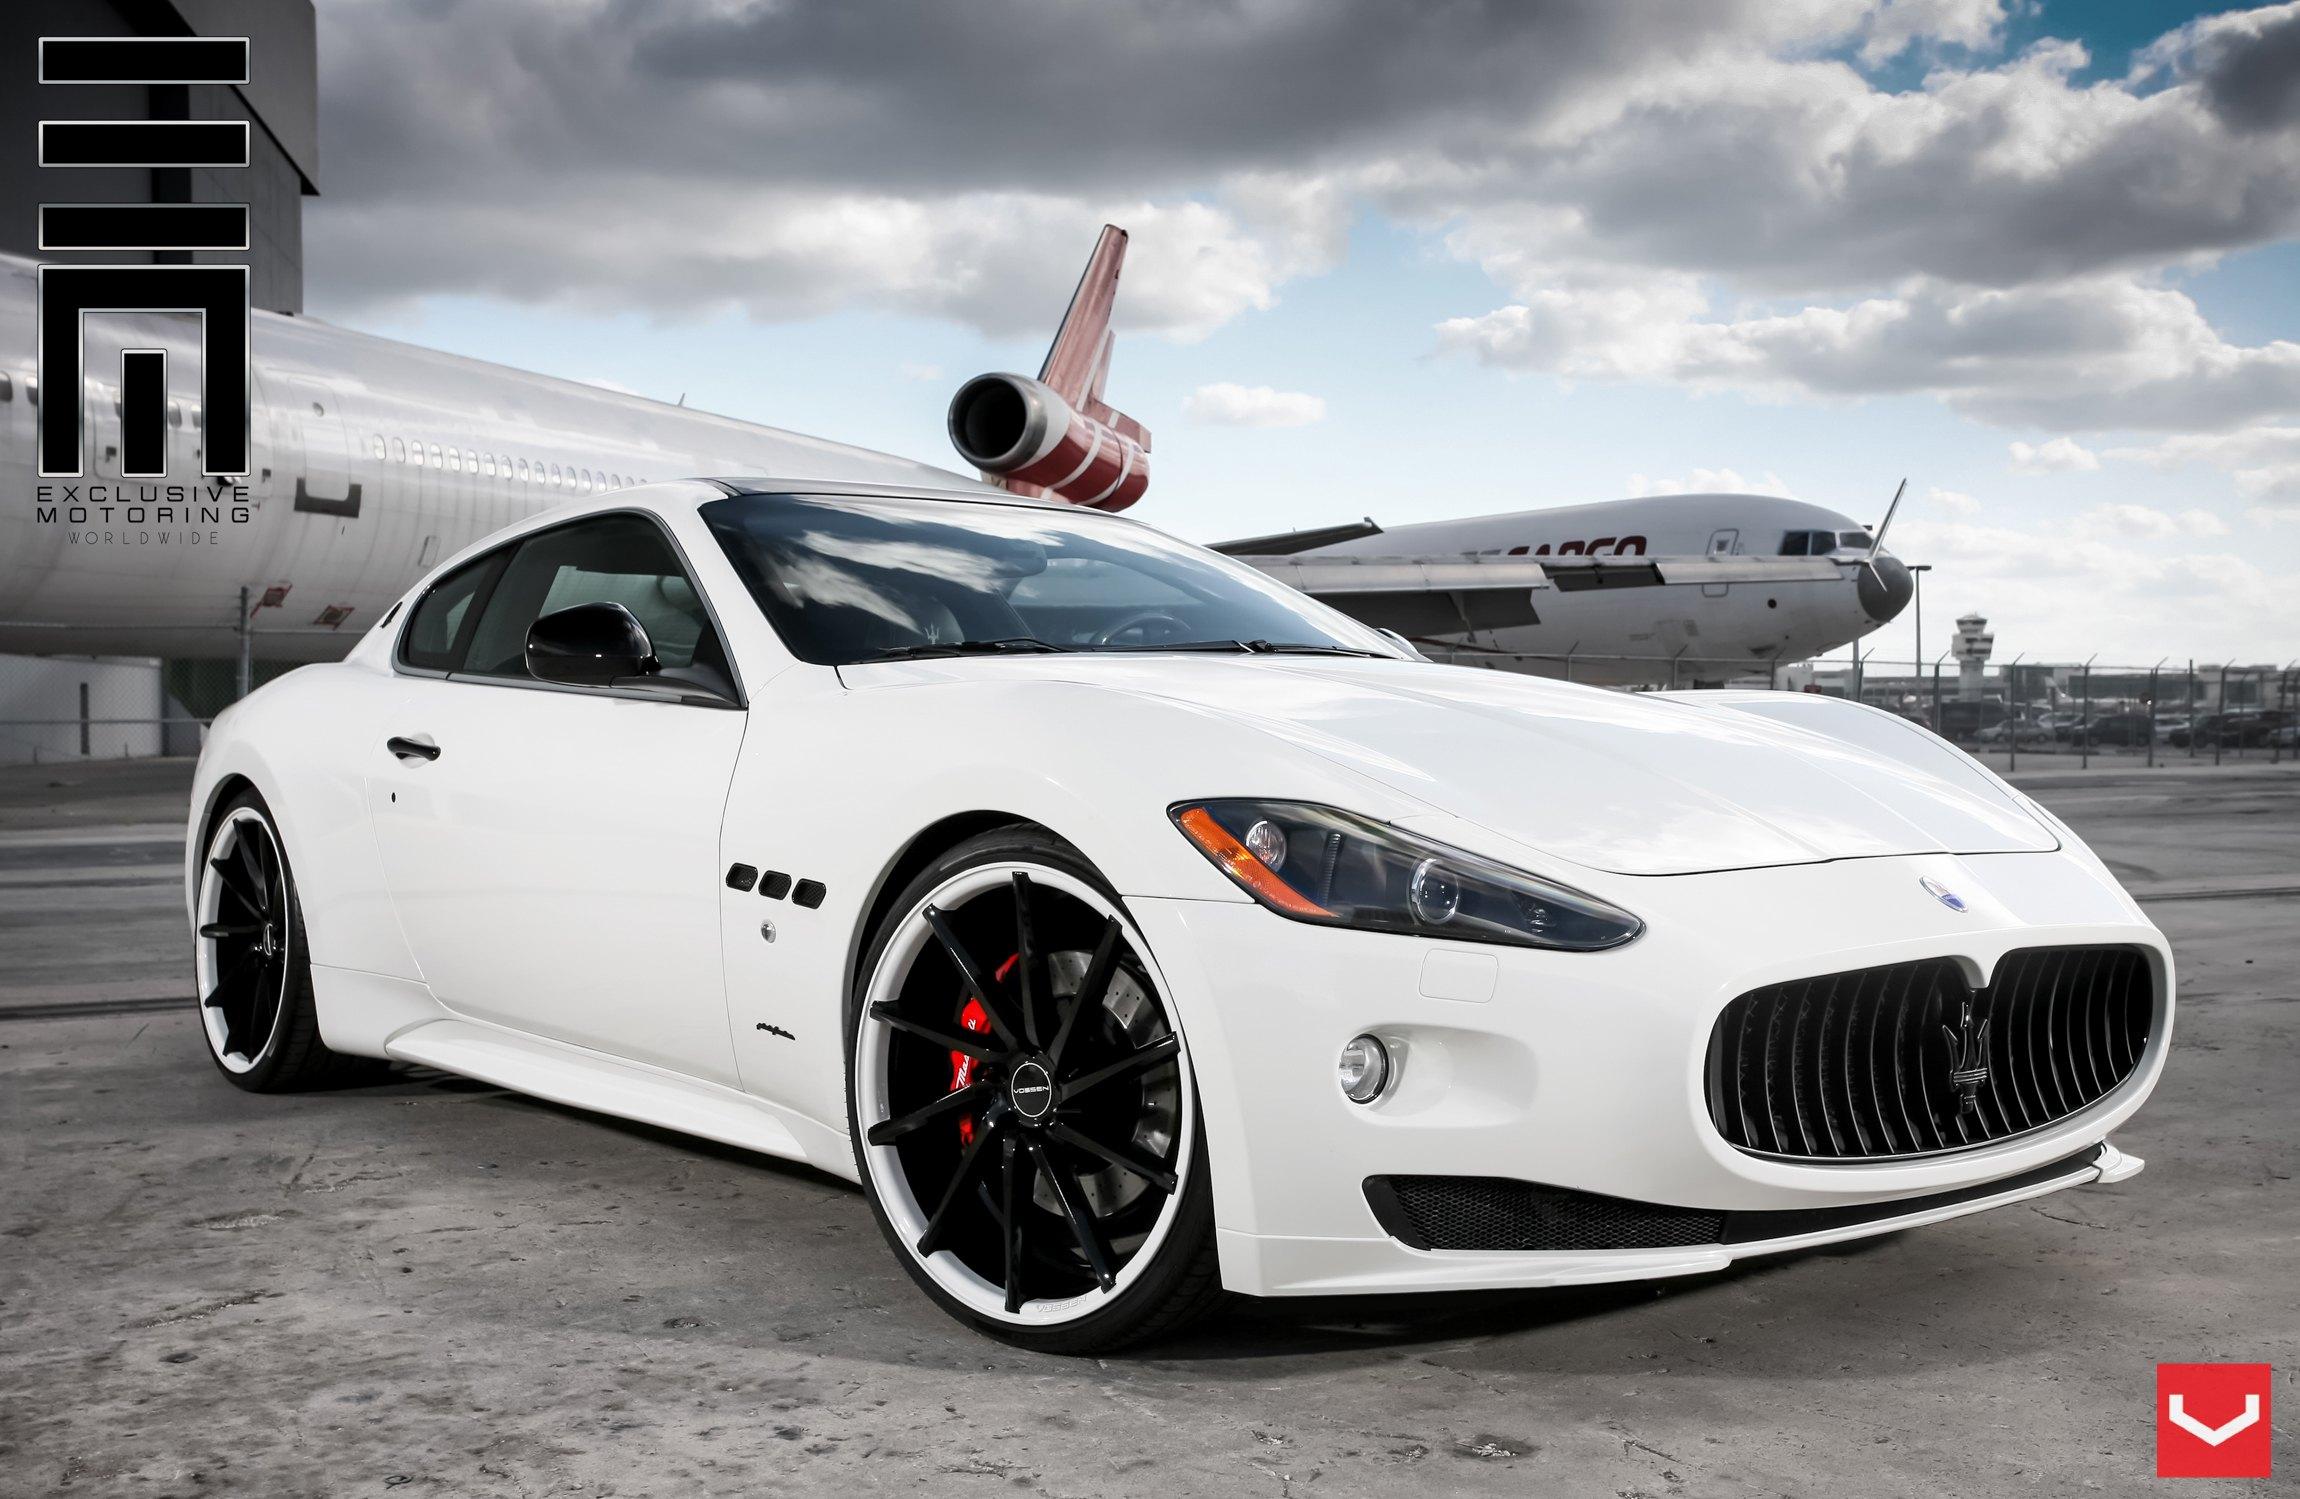 Custom White Maserati Granturismo With Black Grille Photo By Vossen